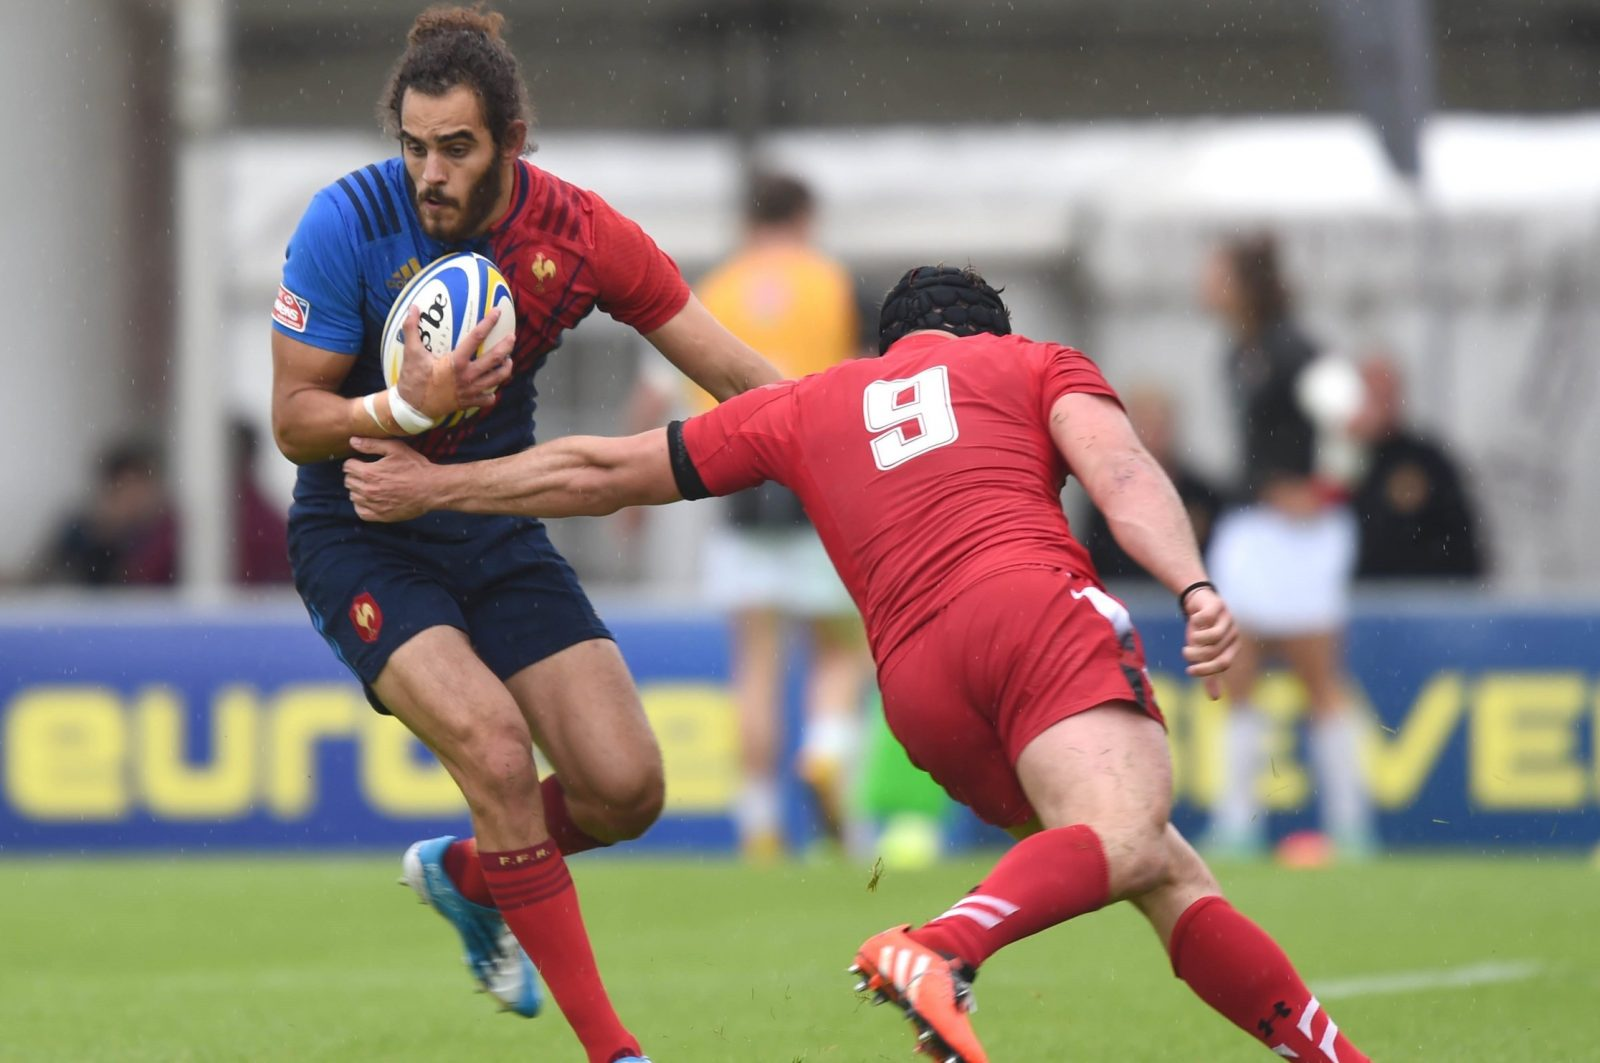 Interview de Jonathan Laugel (7's rugby)